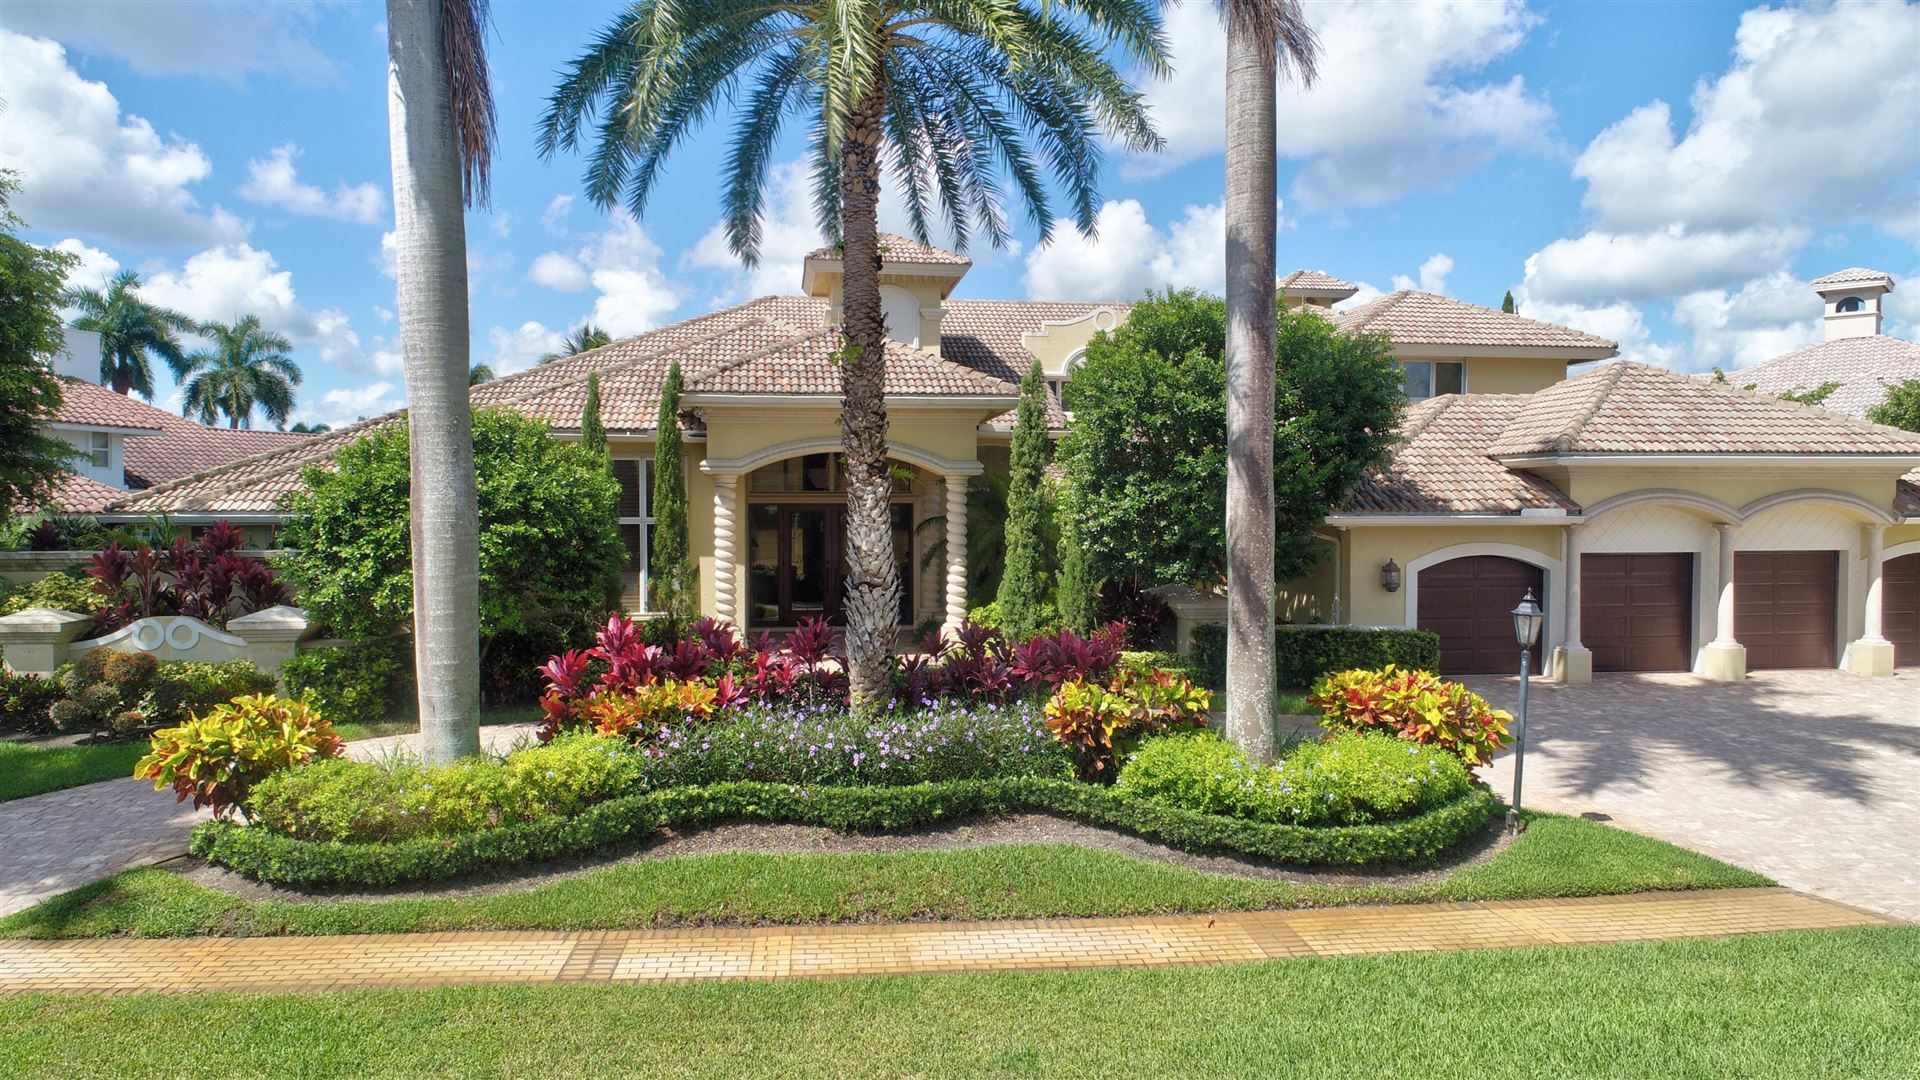 17100 Whitehaven Drive, Boca Raton, FL 33496 - #: RX-10660933